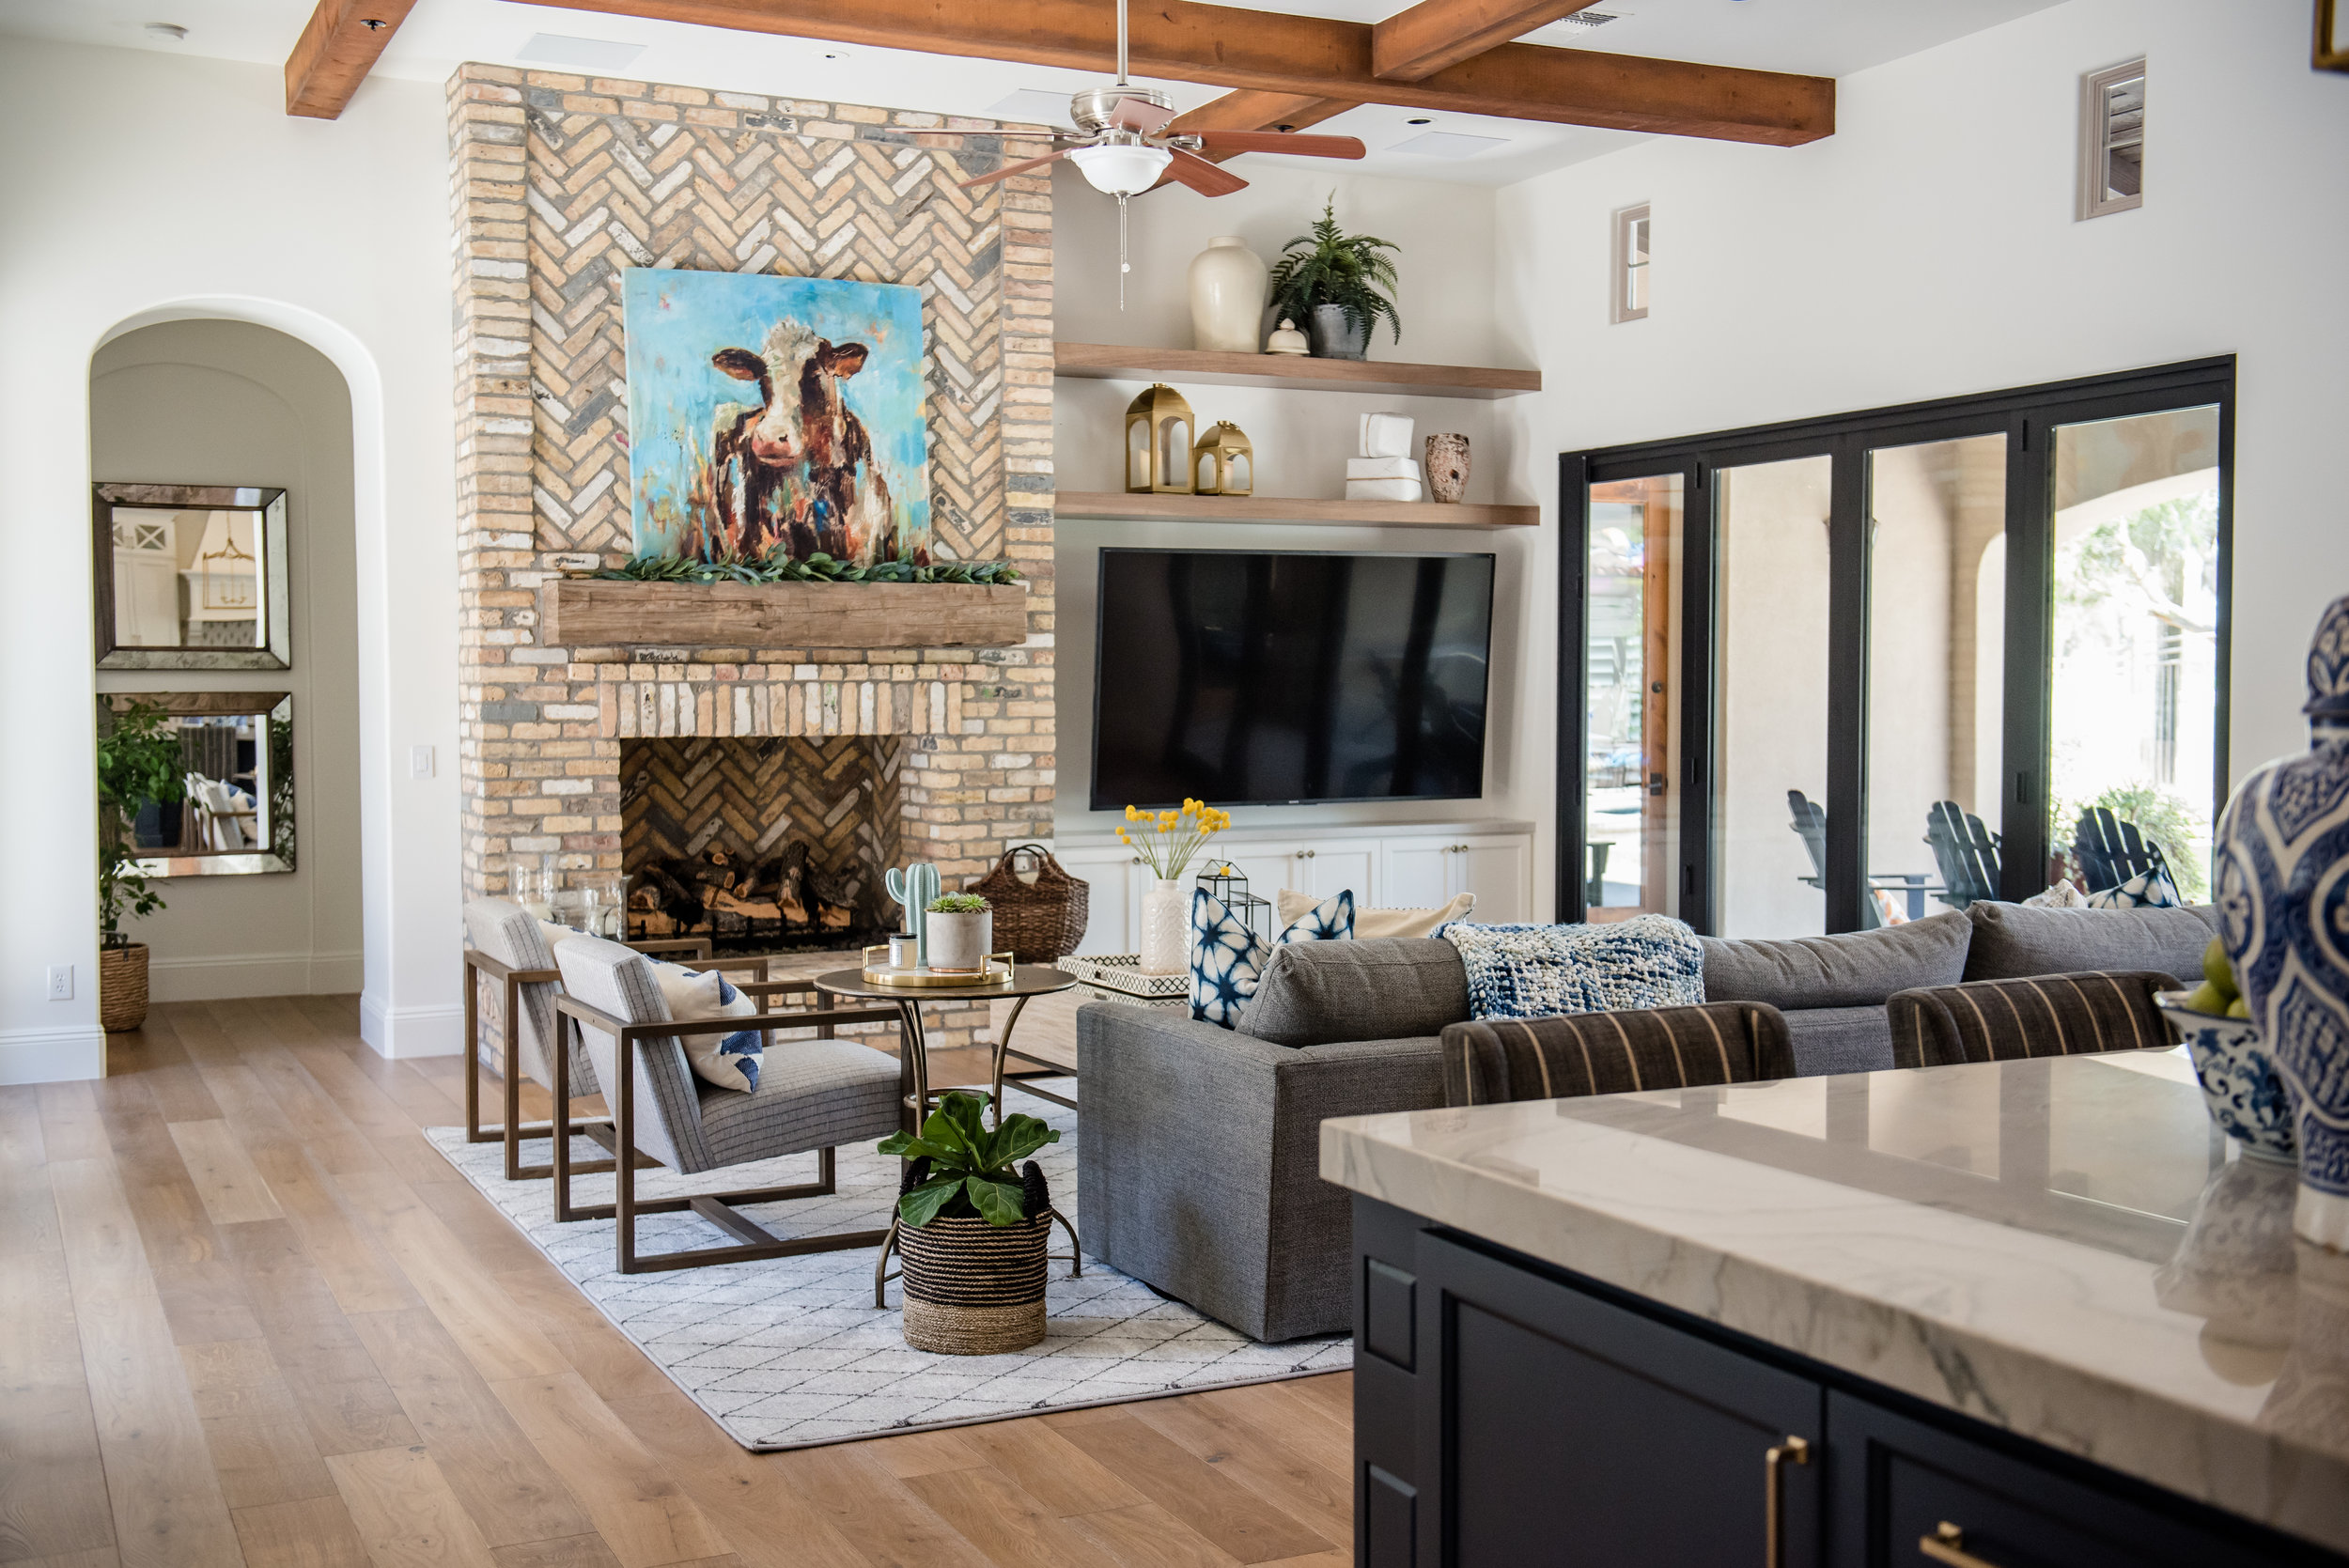 33+fireplace+brick+woodenchairs+art+brass+accessories+builtins+familyroom+rug.jpg